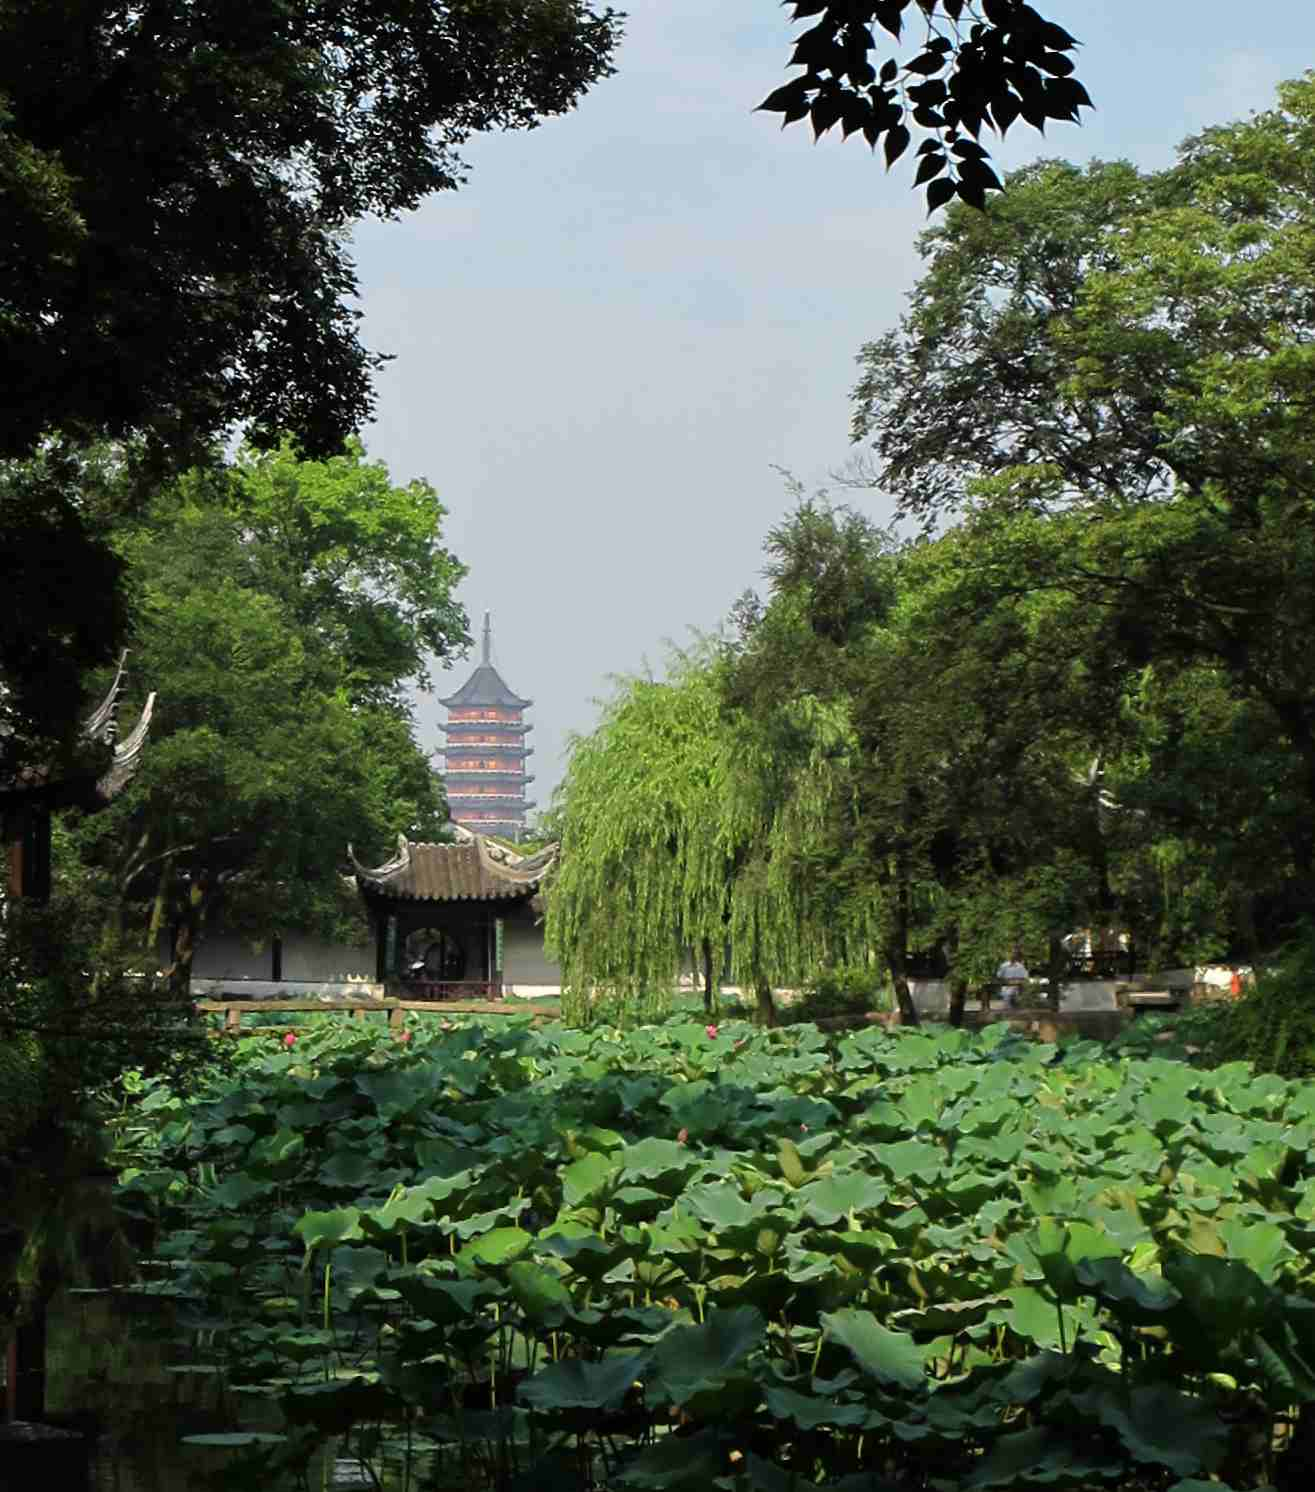 Garden of Humble Administrator, borrowed pagoda